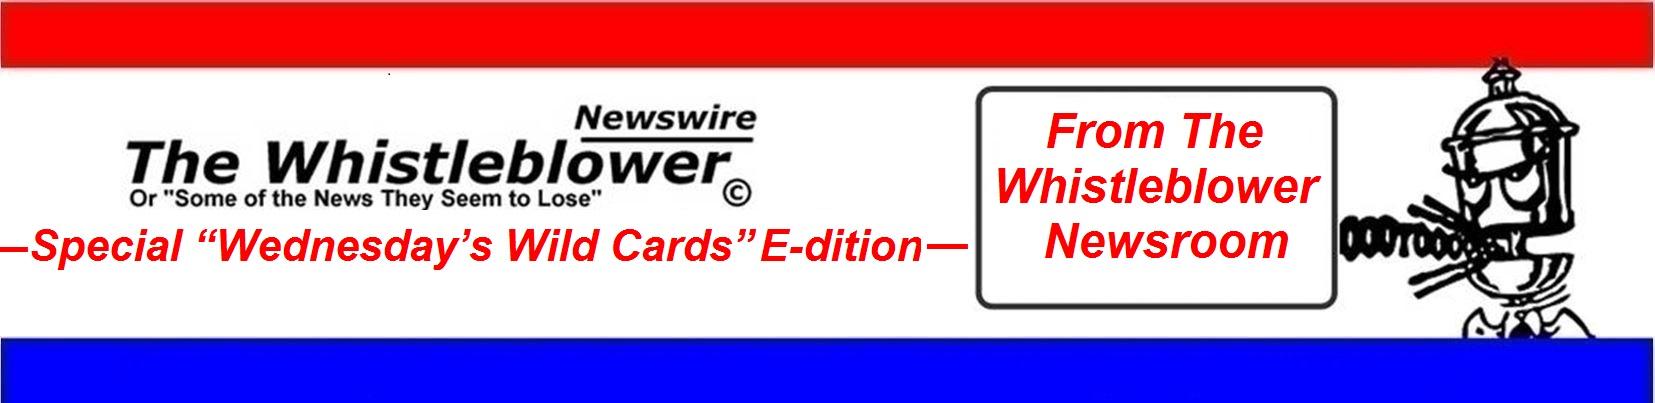 wednesday-wild-cards